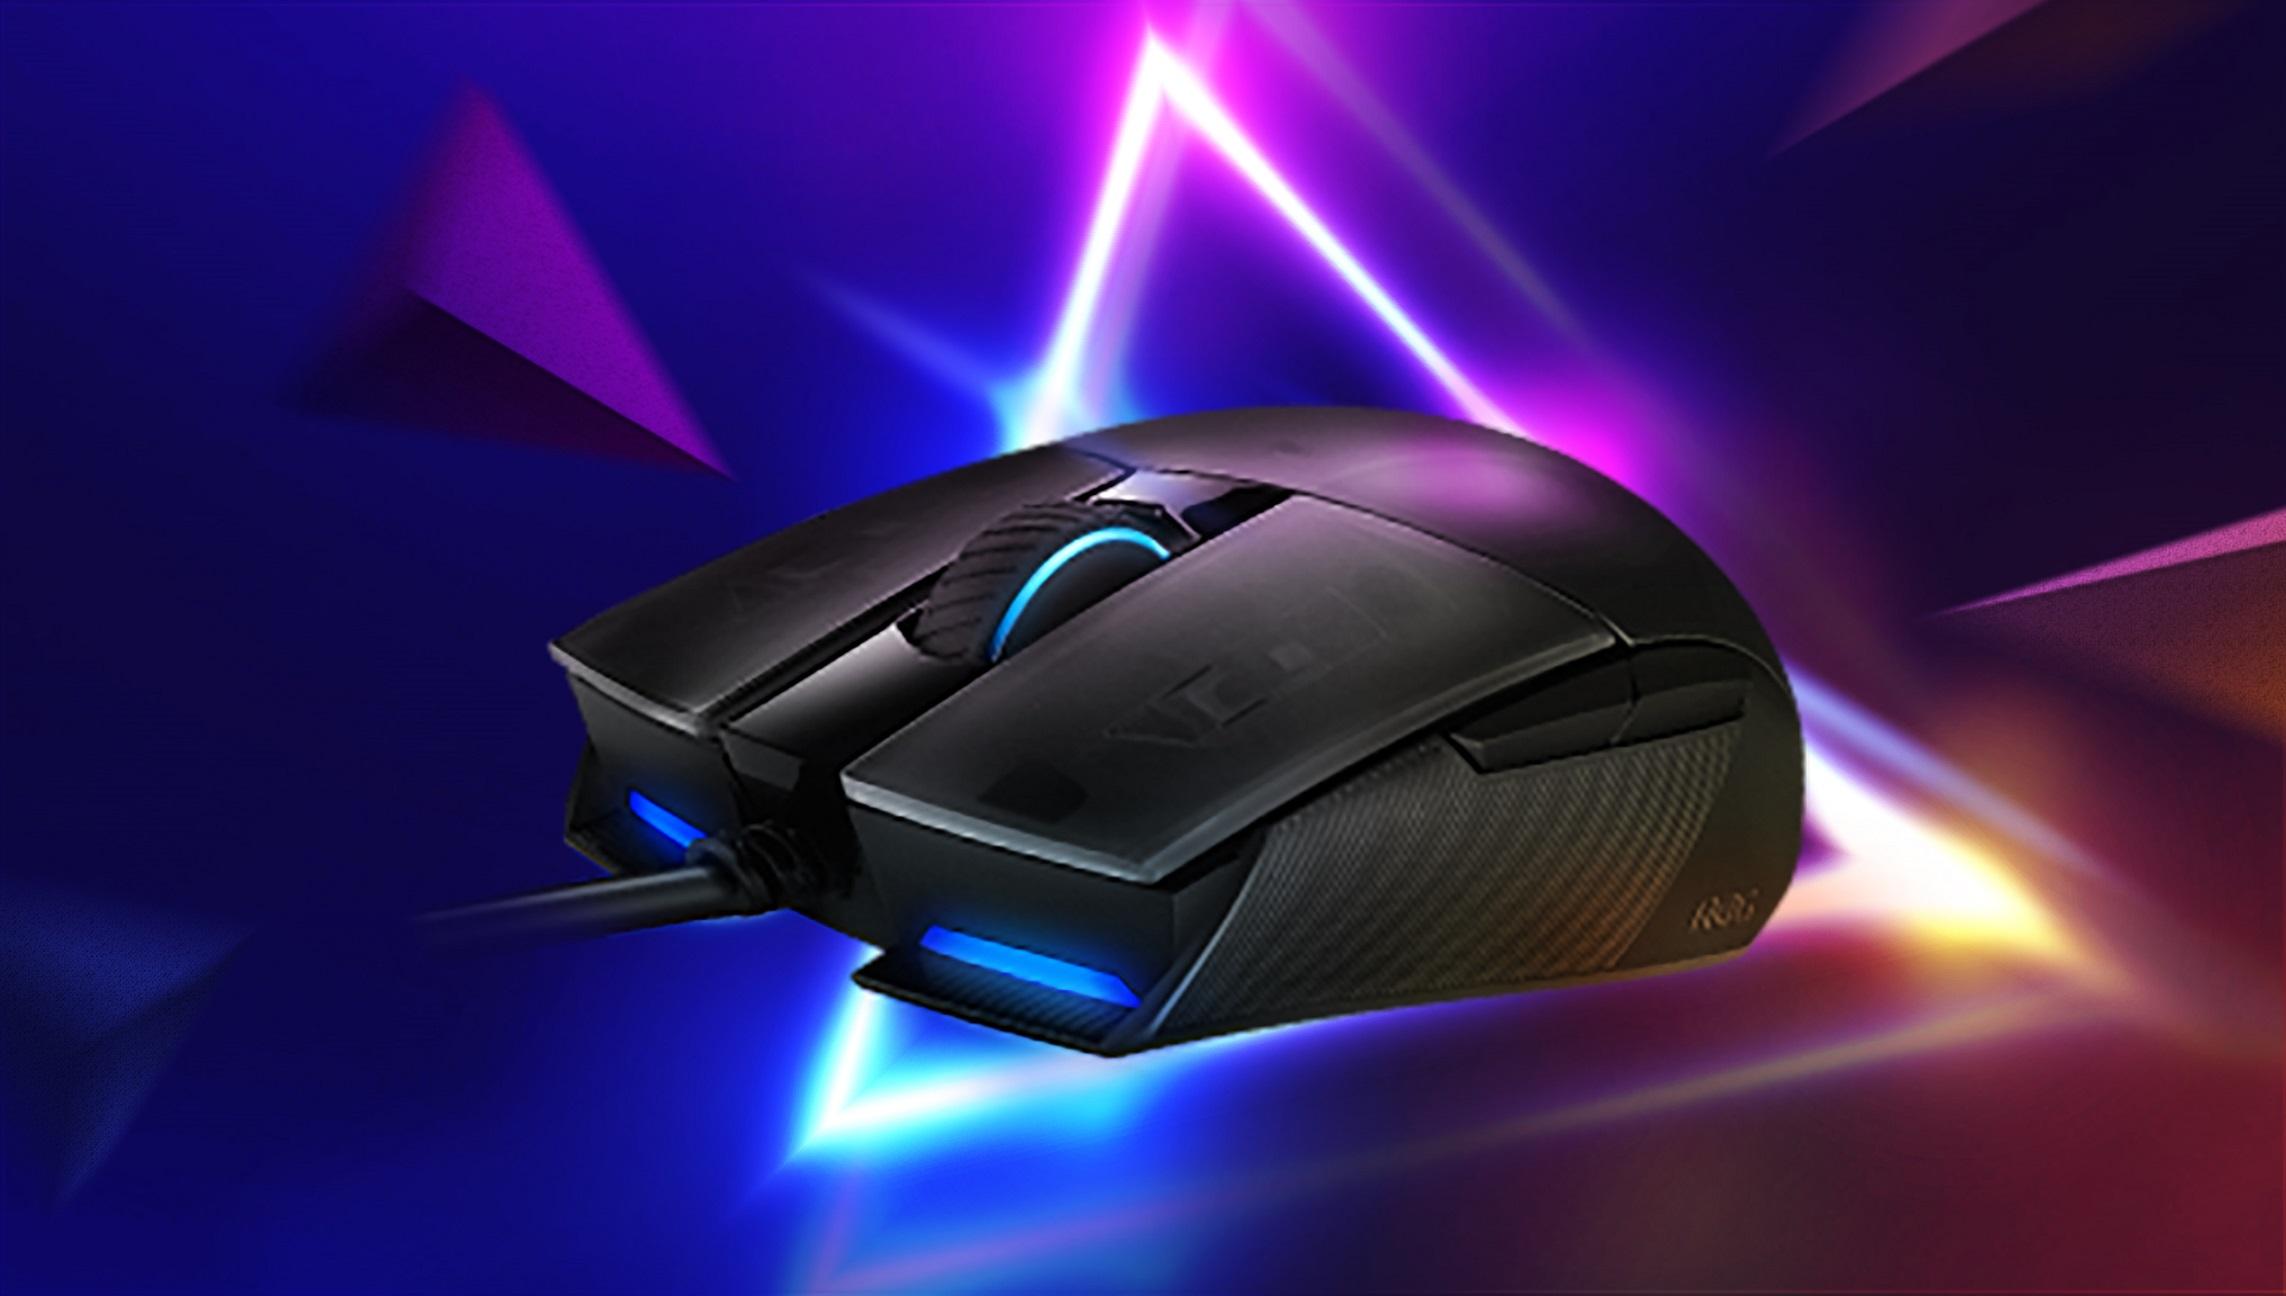 ROG Strix Impact II主打6,200-dpi光學感測器、輕量設計、雙手通用等特色,為喜愛輕量手感玩家們的電競滑鼠首選。